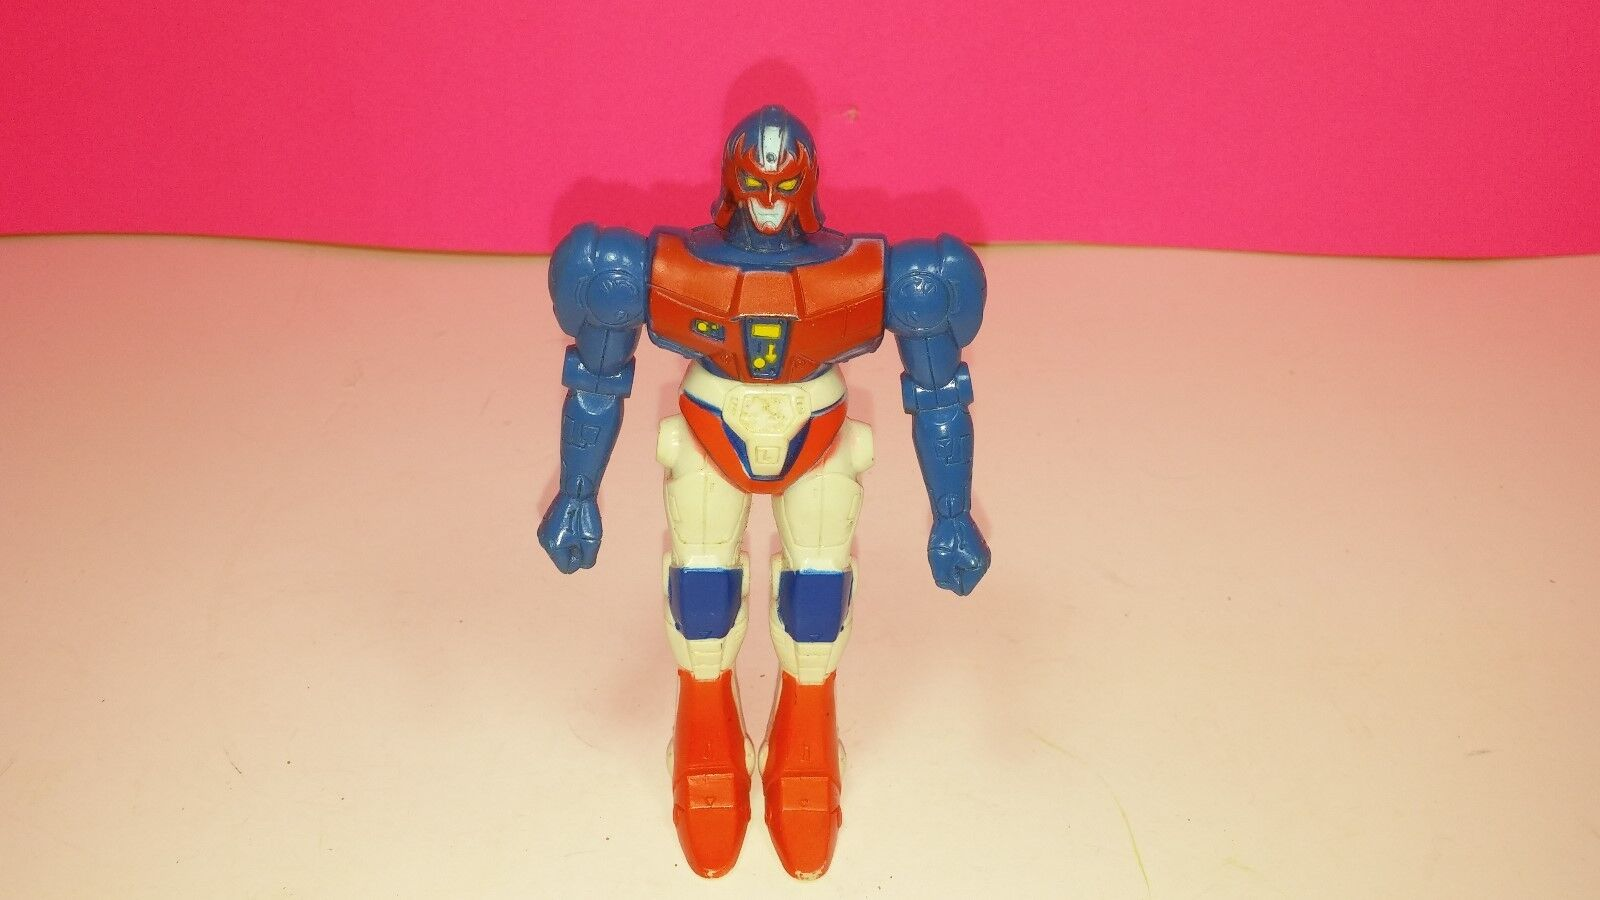 bandai giappone 1988 sofubi robot action figure vintage del giappone bandai fa5ede